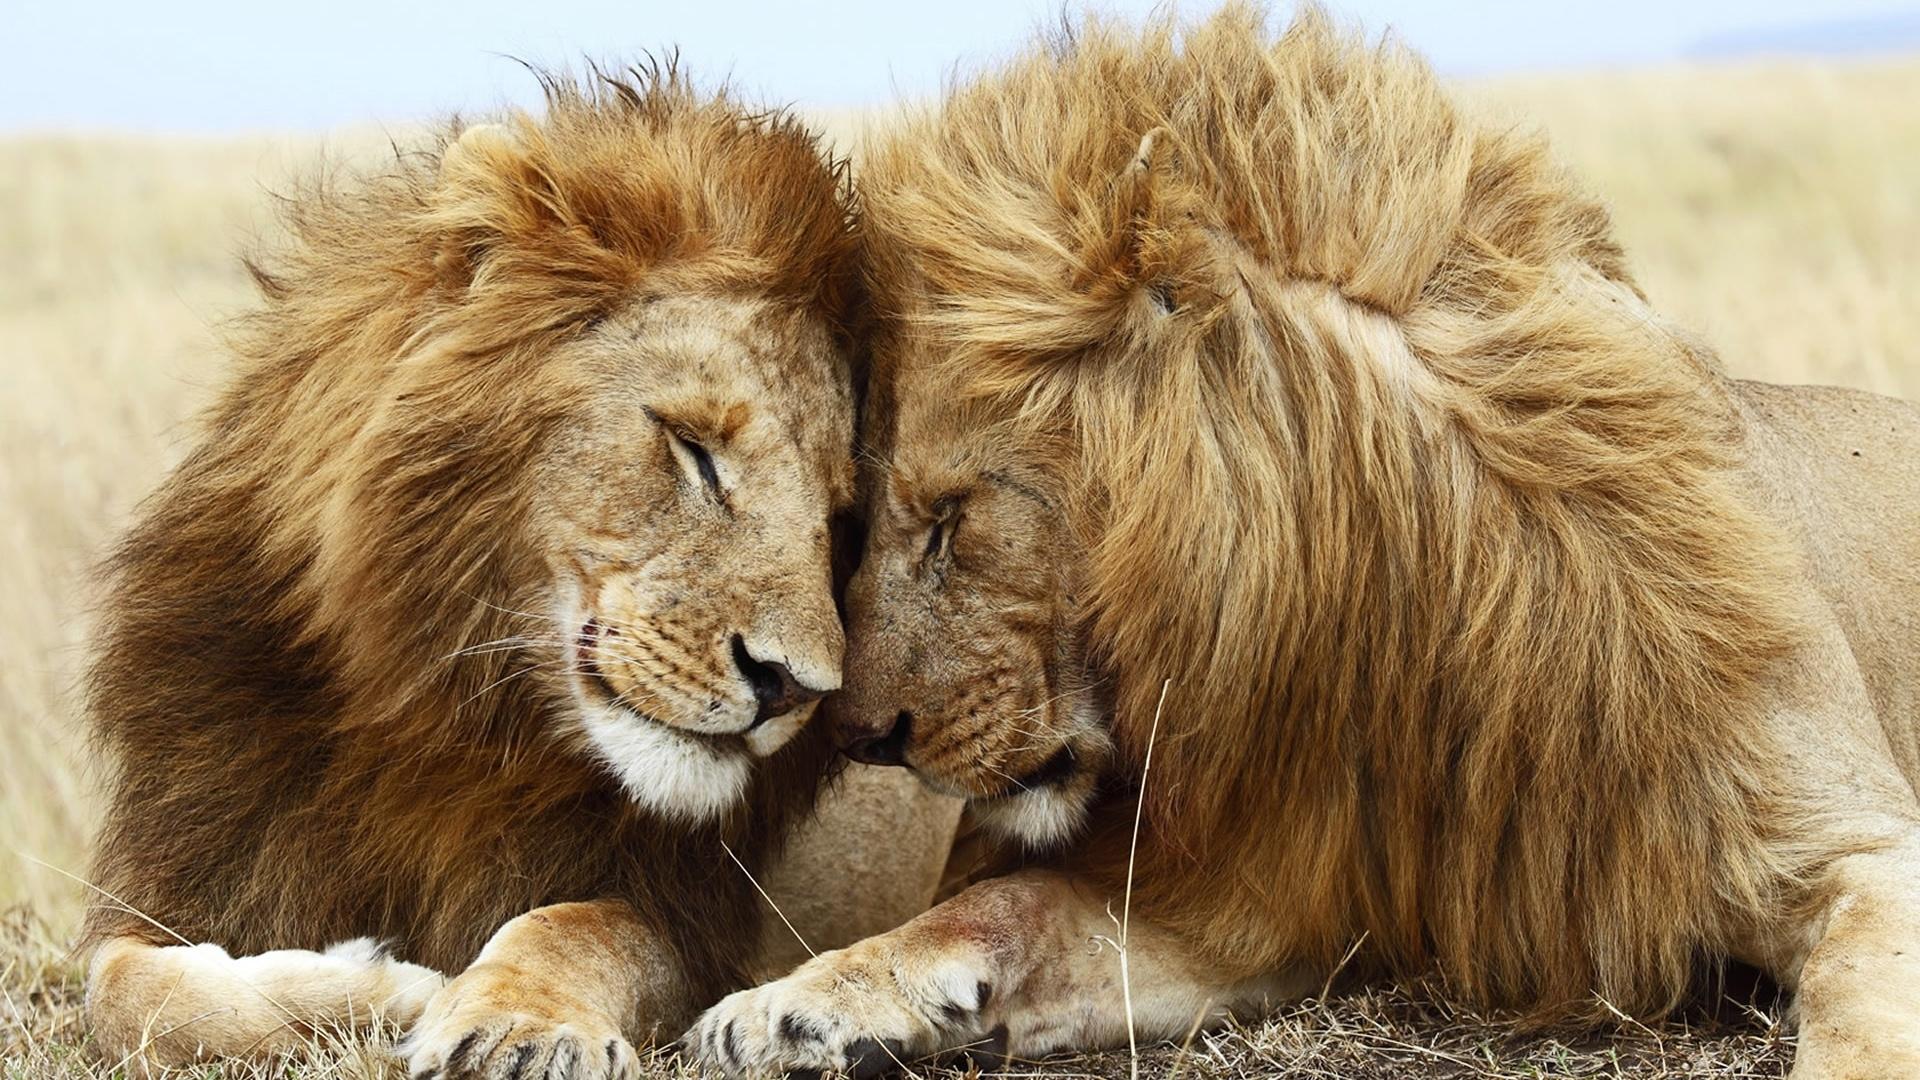 download wallpaper 1920x1080 lion, cat, couple, mane, rest full hd